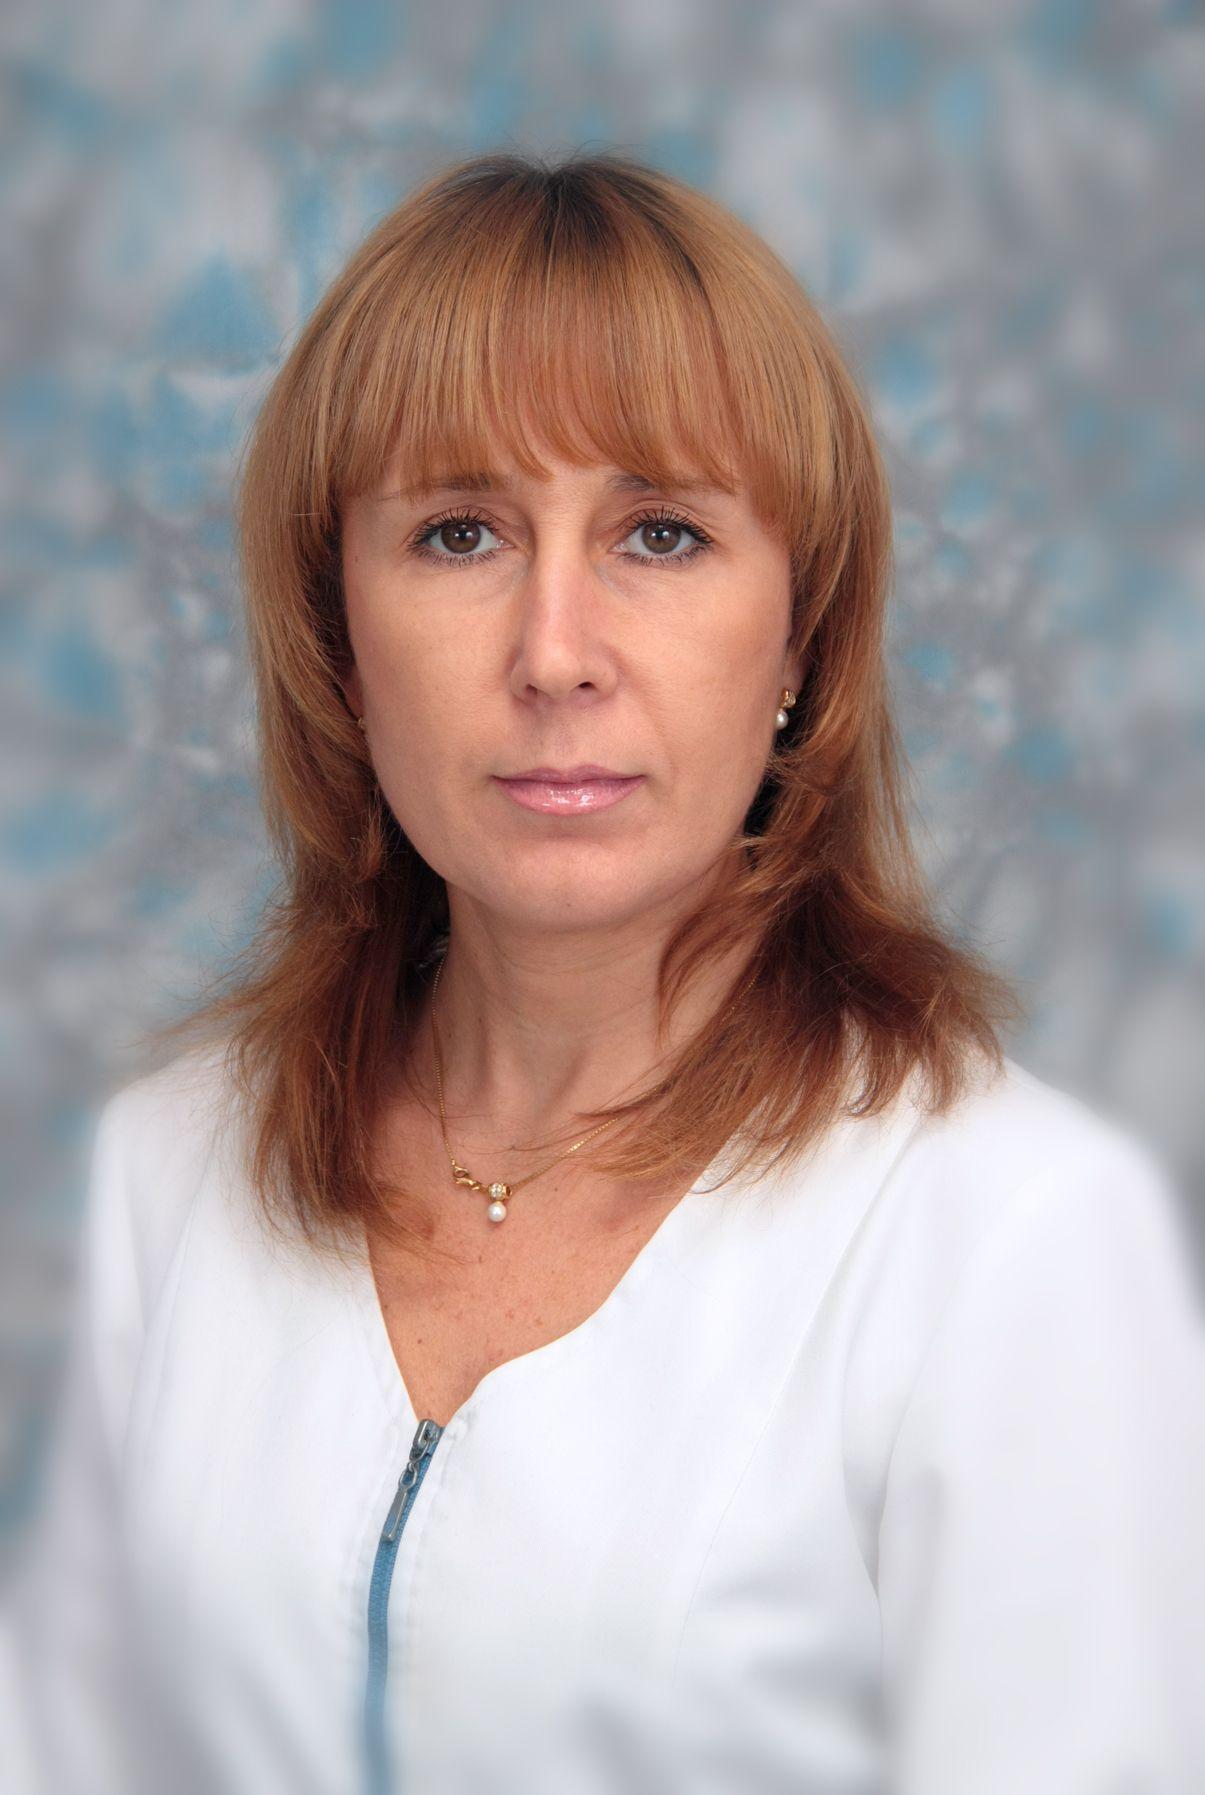 Ткаченко Лада Анатольевна - tkachenko_lada_anatolevna_terapevt